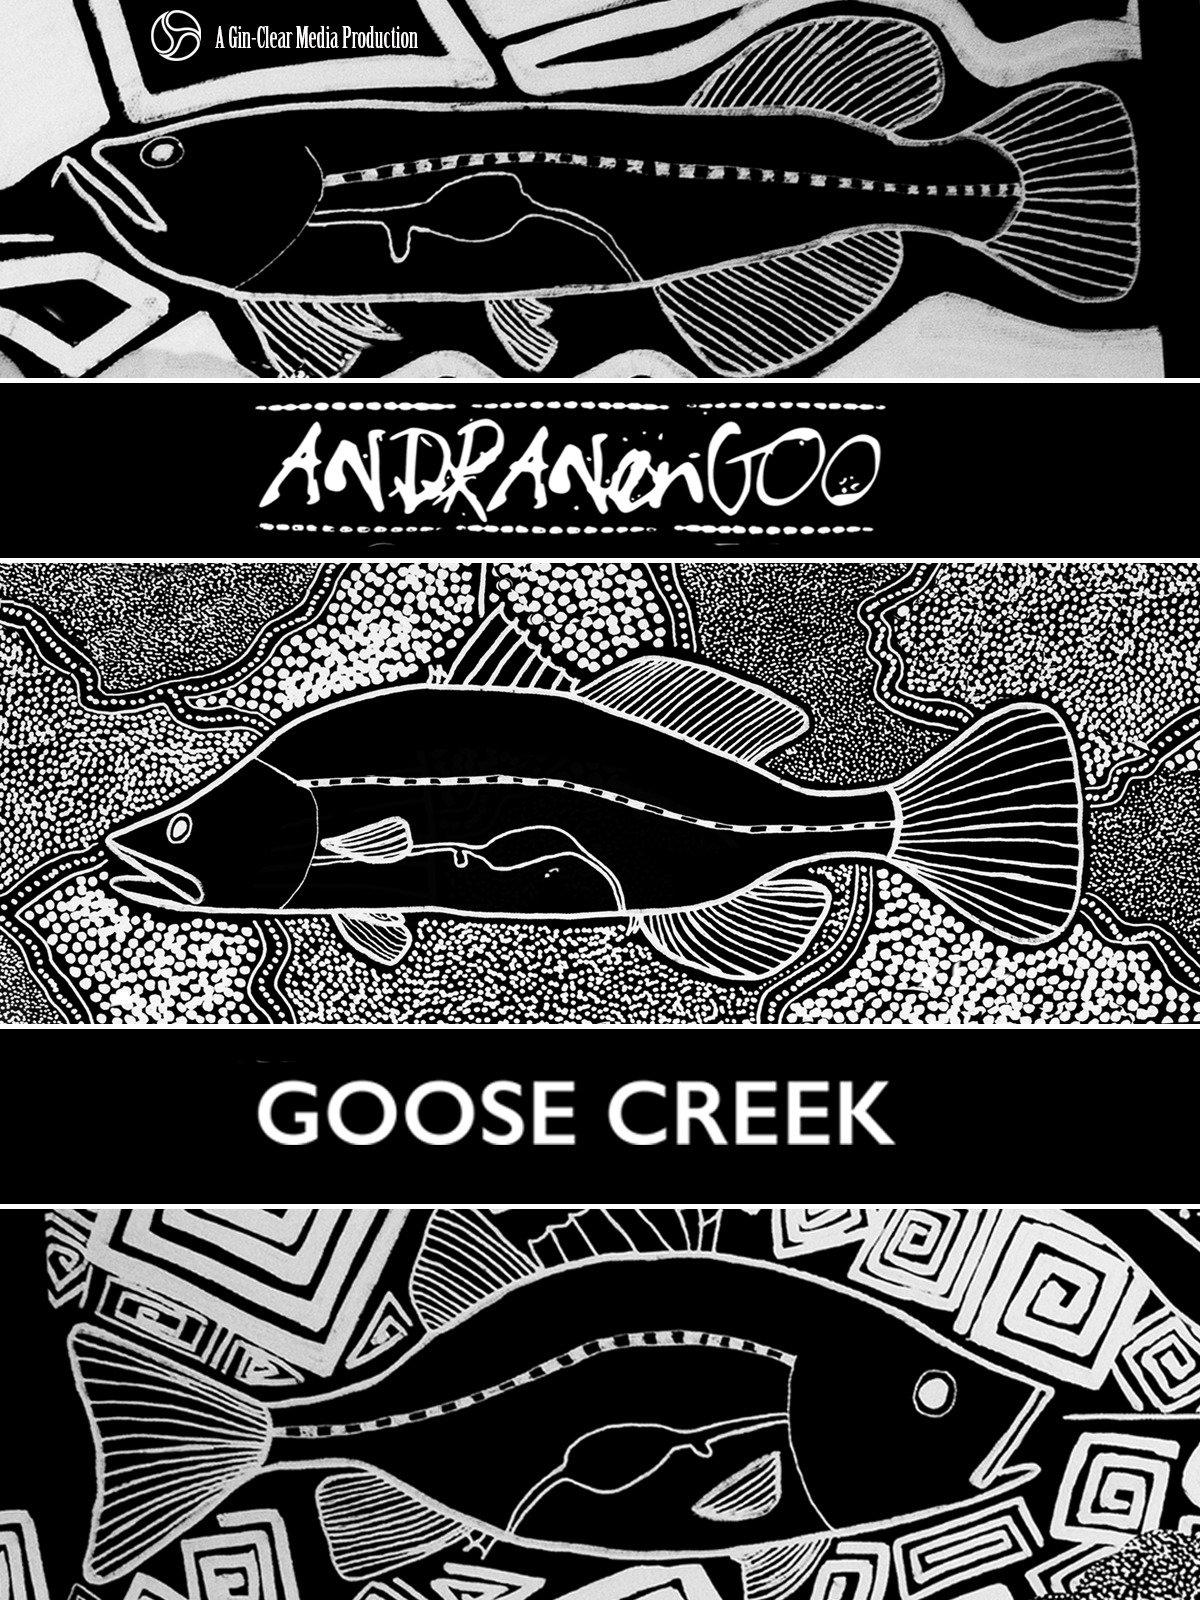 Andranangoo - Goose Creek